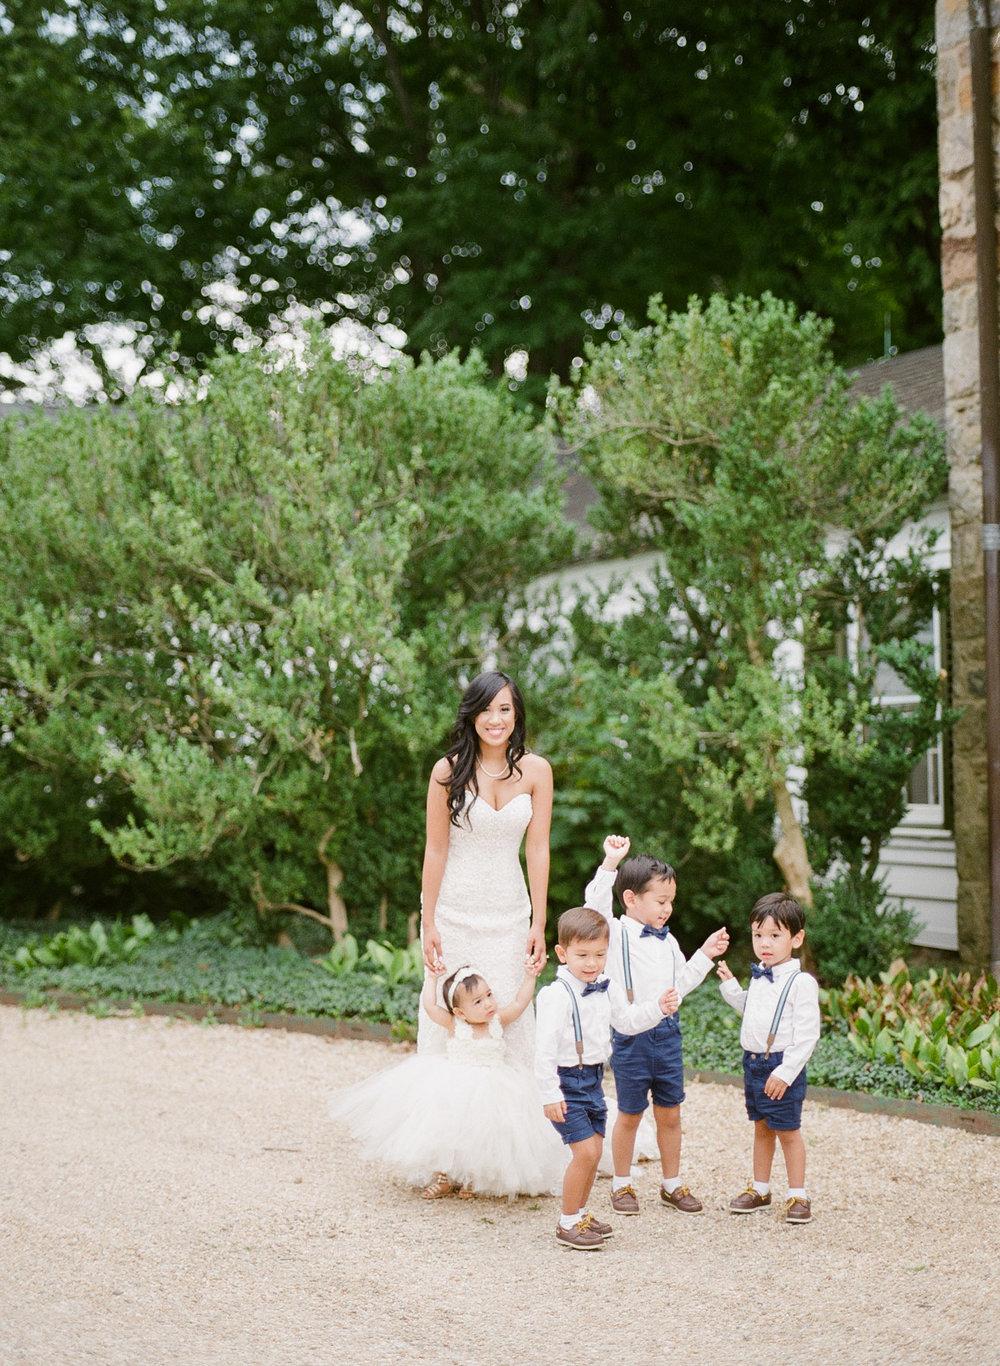 Virginia-Film-Photographer-Wedding-23.jpg